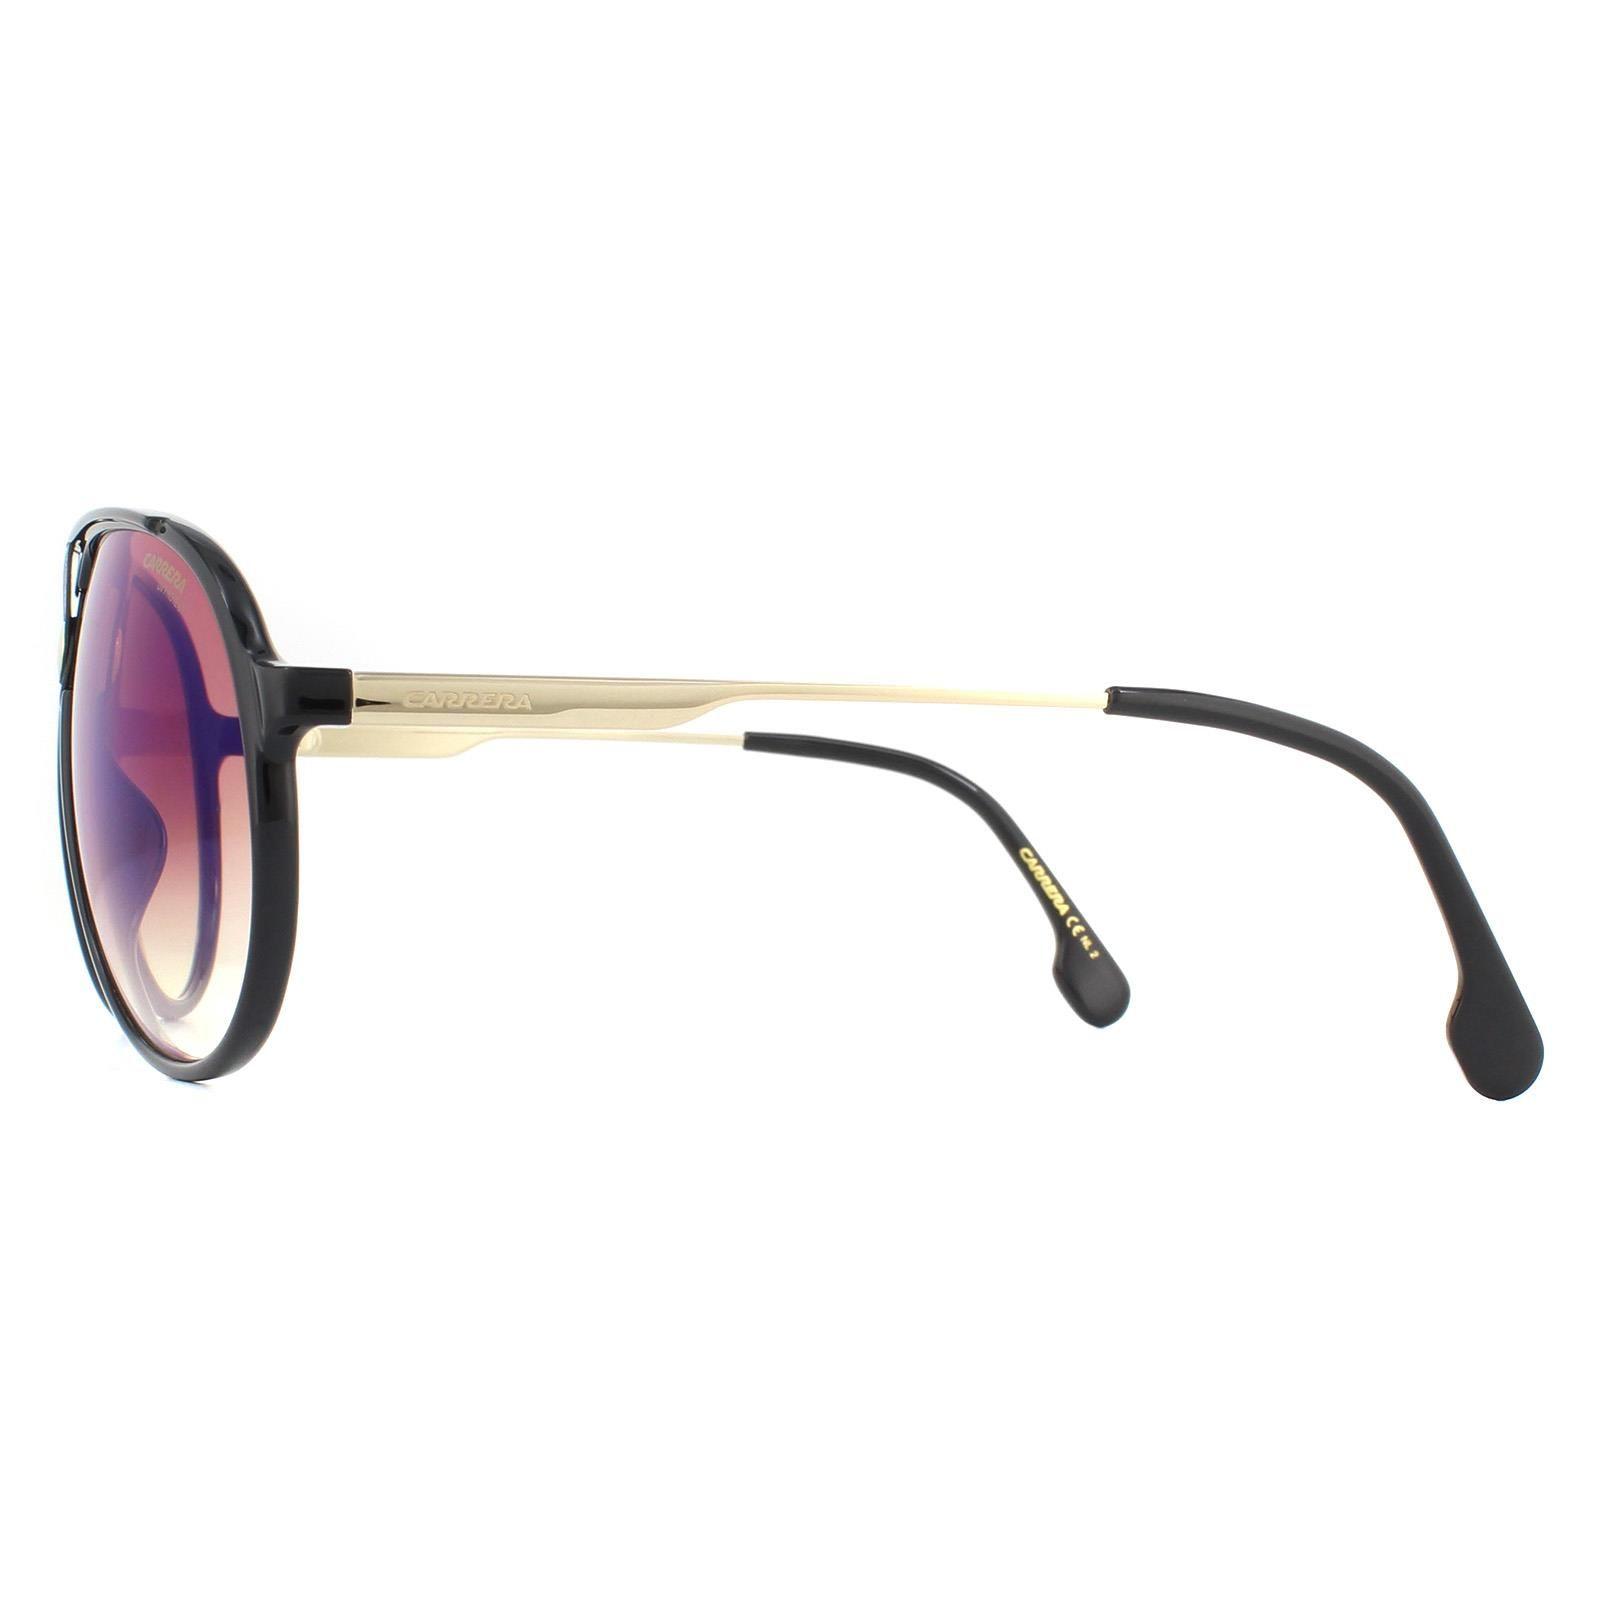 Carrera Sunglasses 1034/S 2M2 A8 Black Gold Brown Blue Gradient